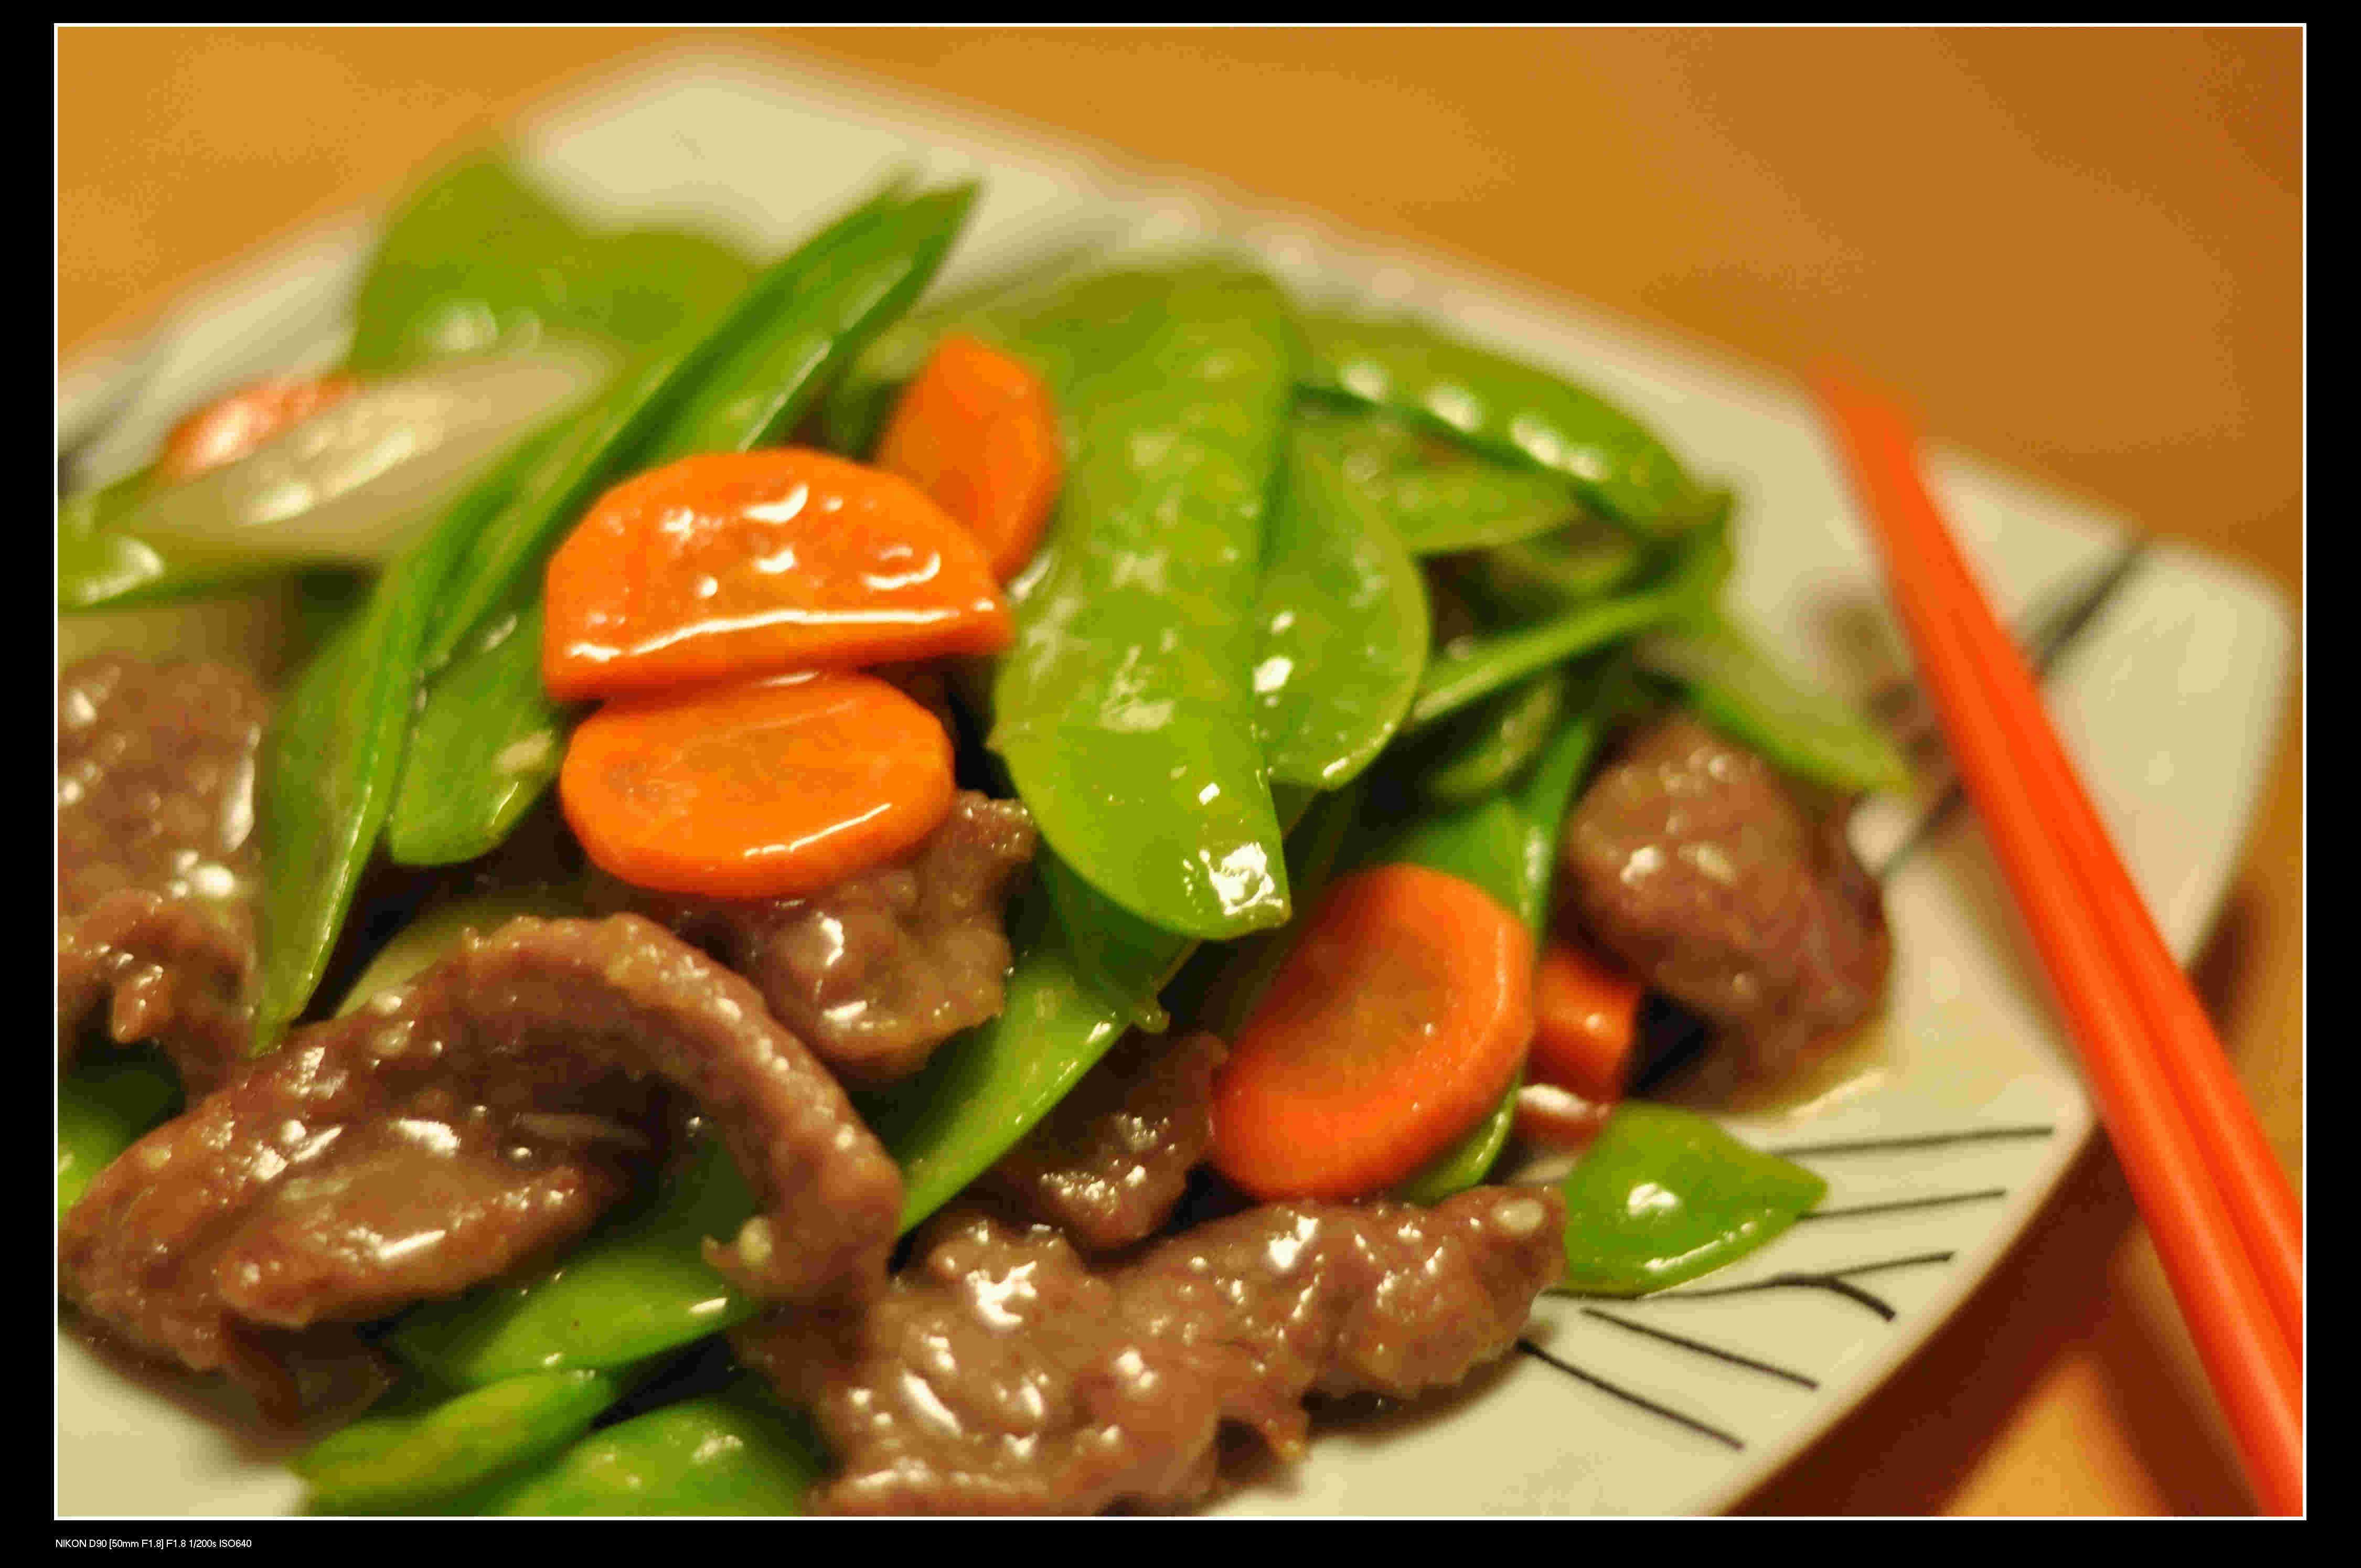 Beef, Snow peas & Carrot stir fry.